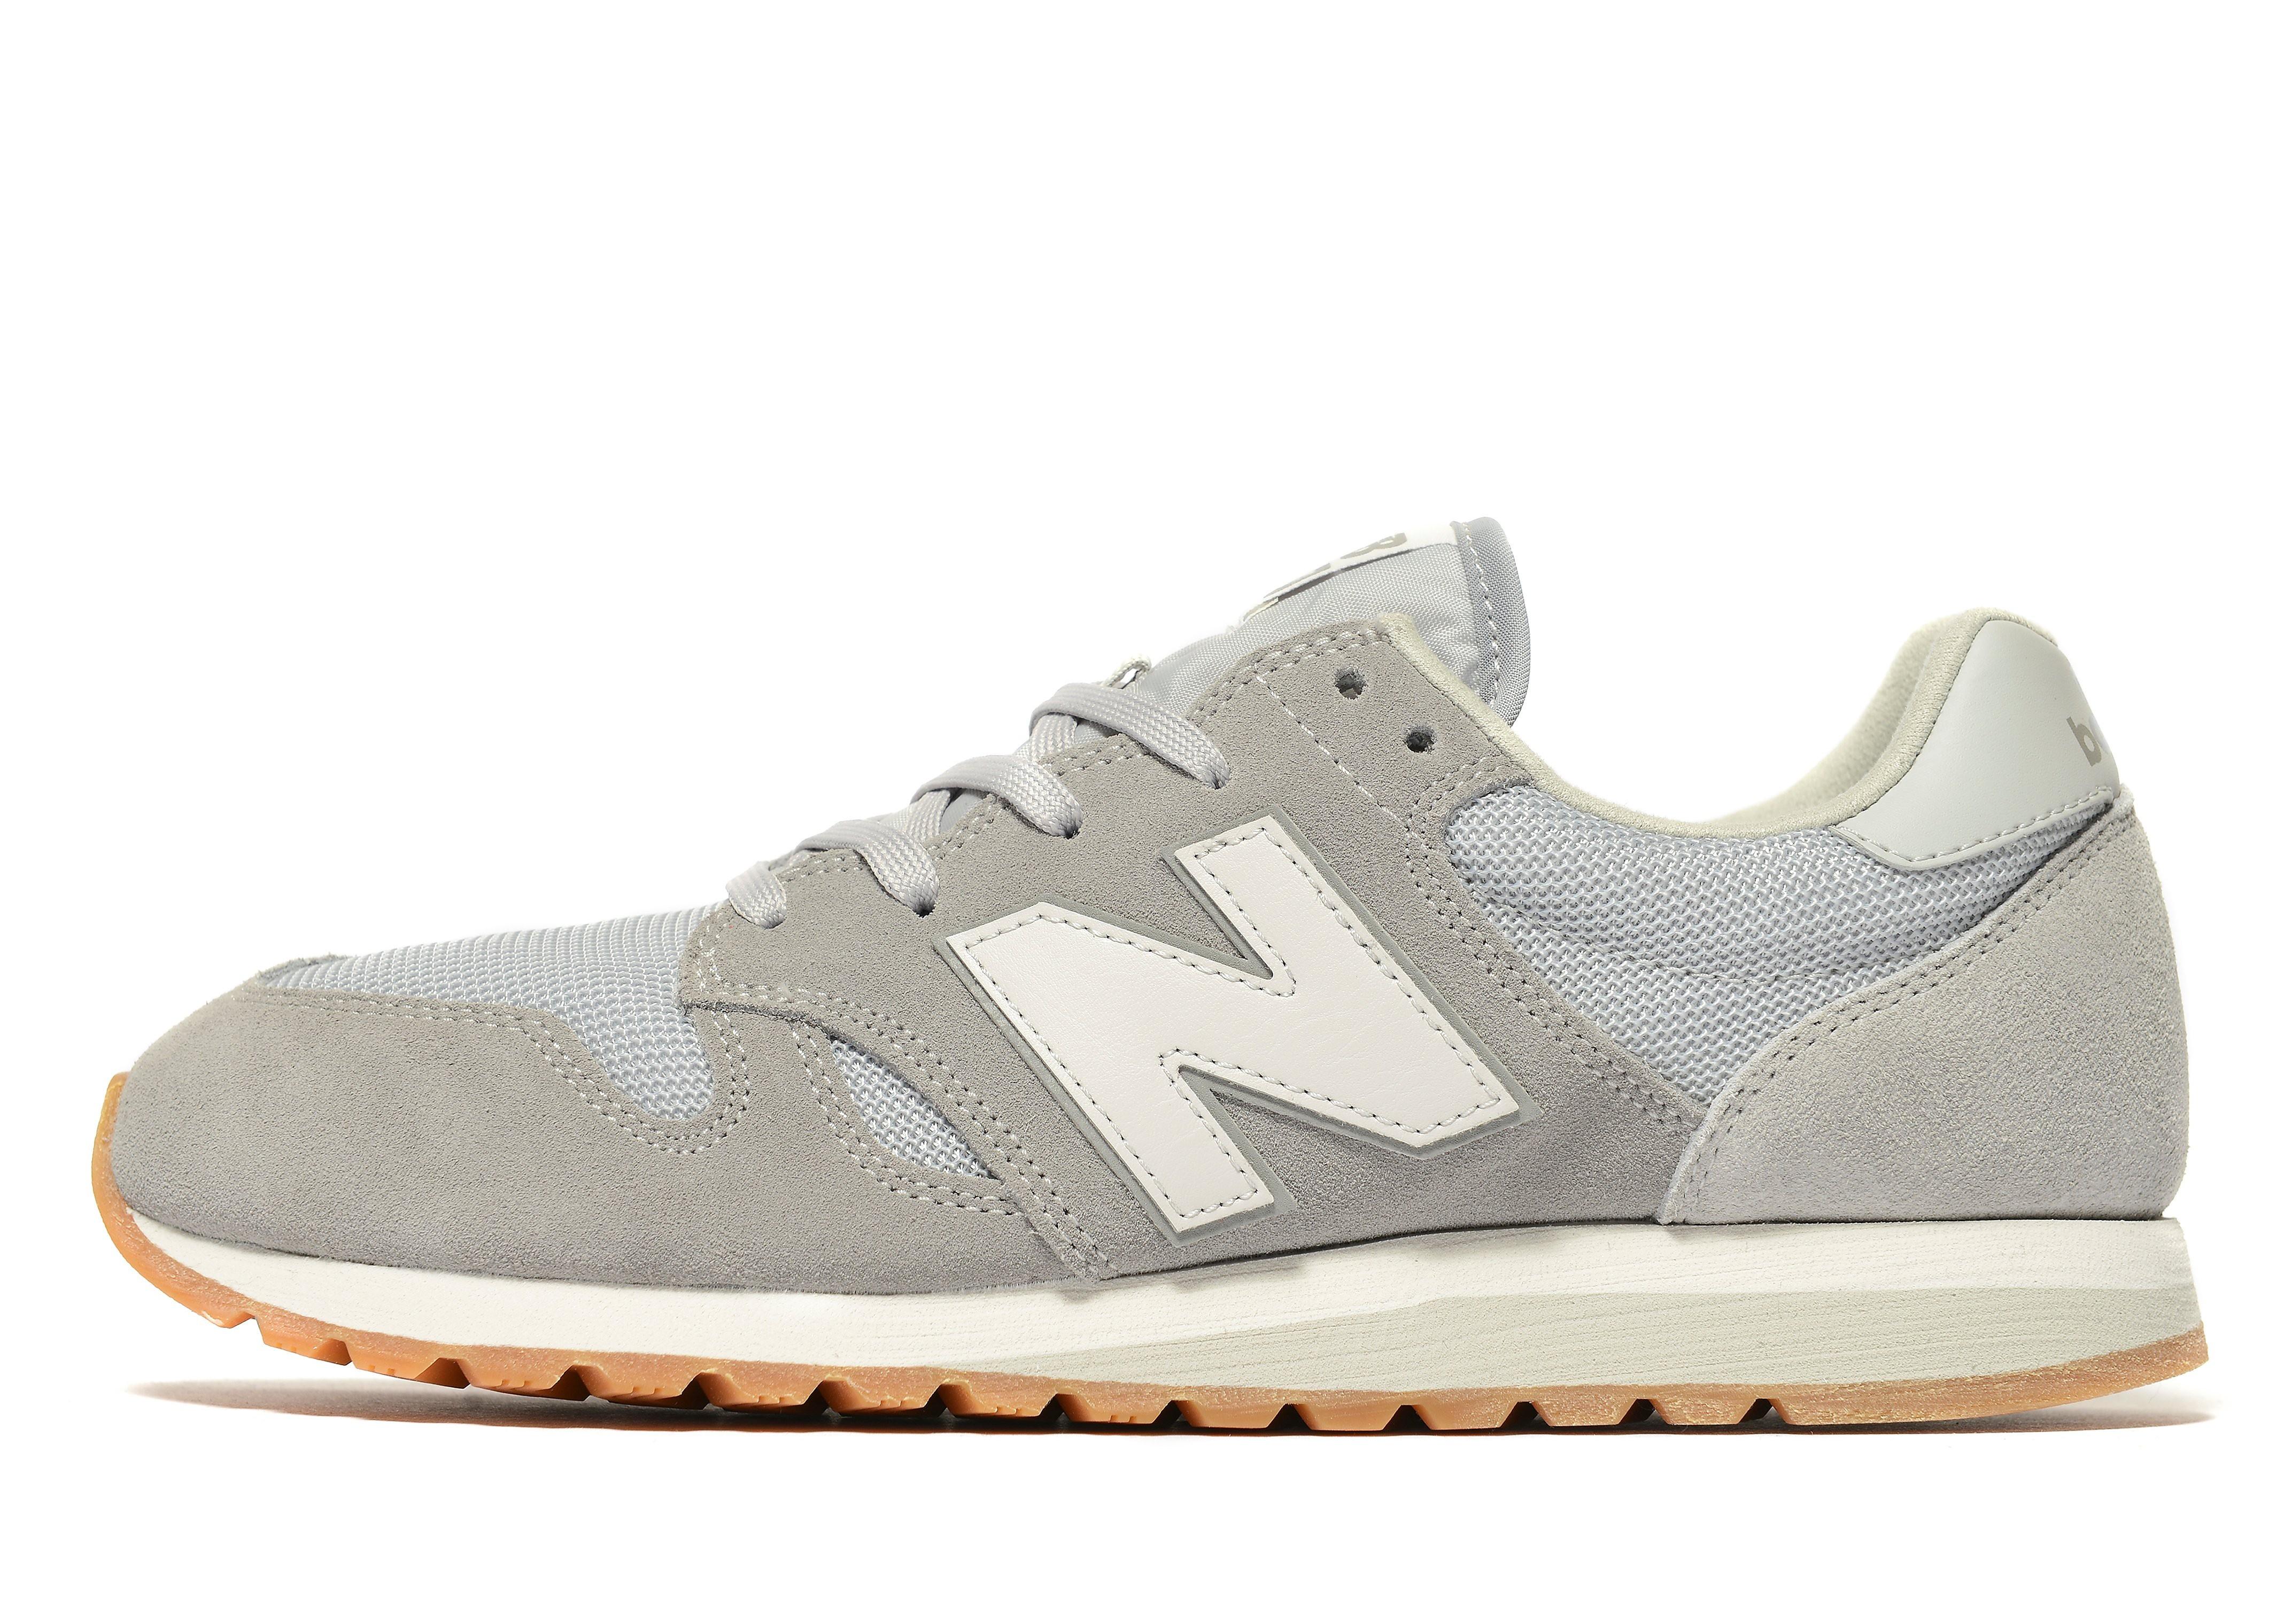 New Balance 520 Vintage